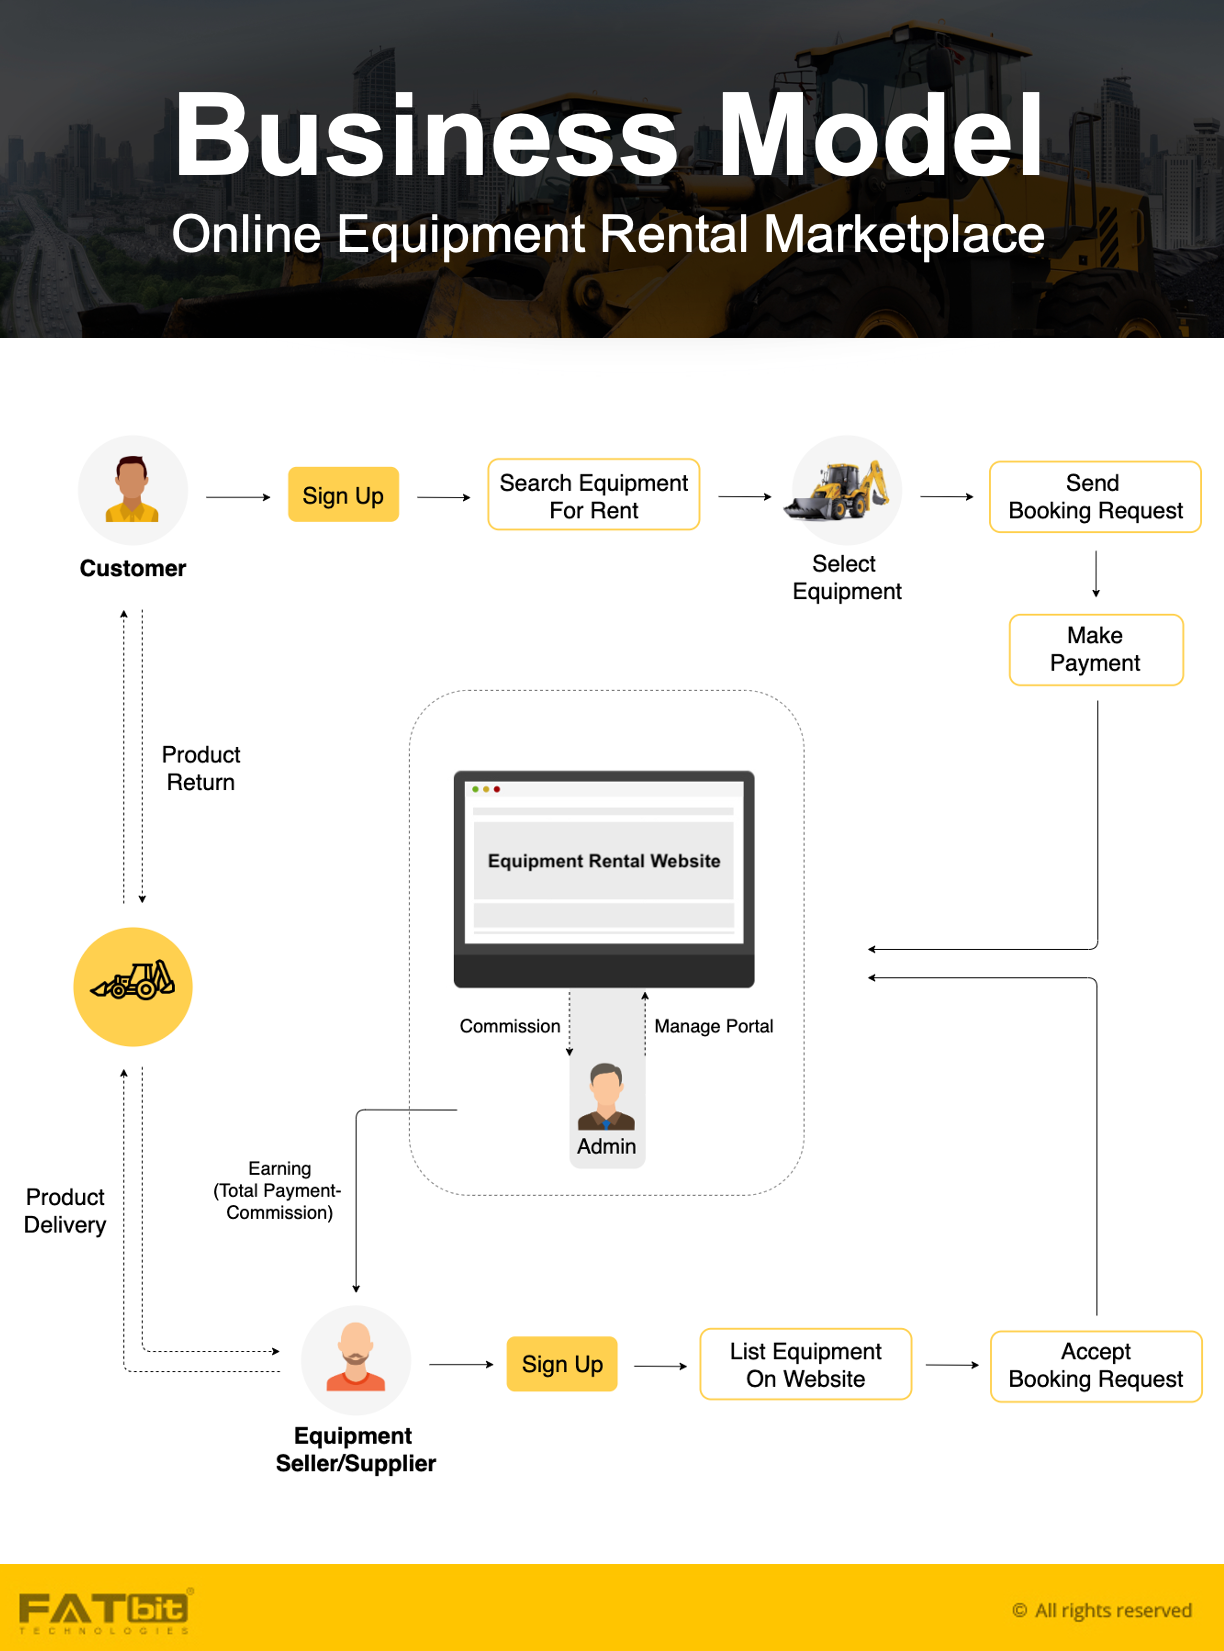 Equipment Rental BM